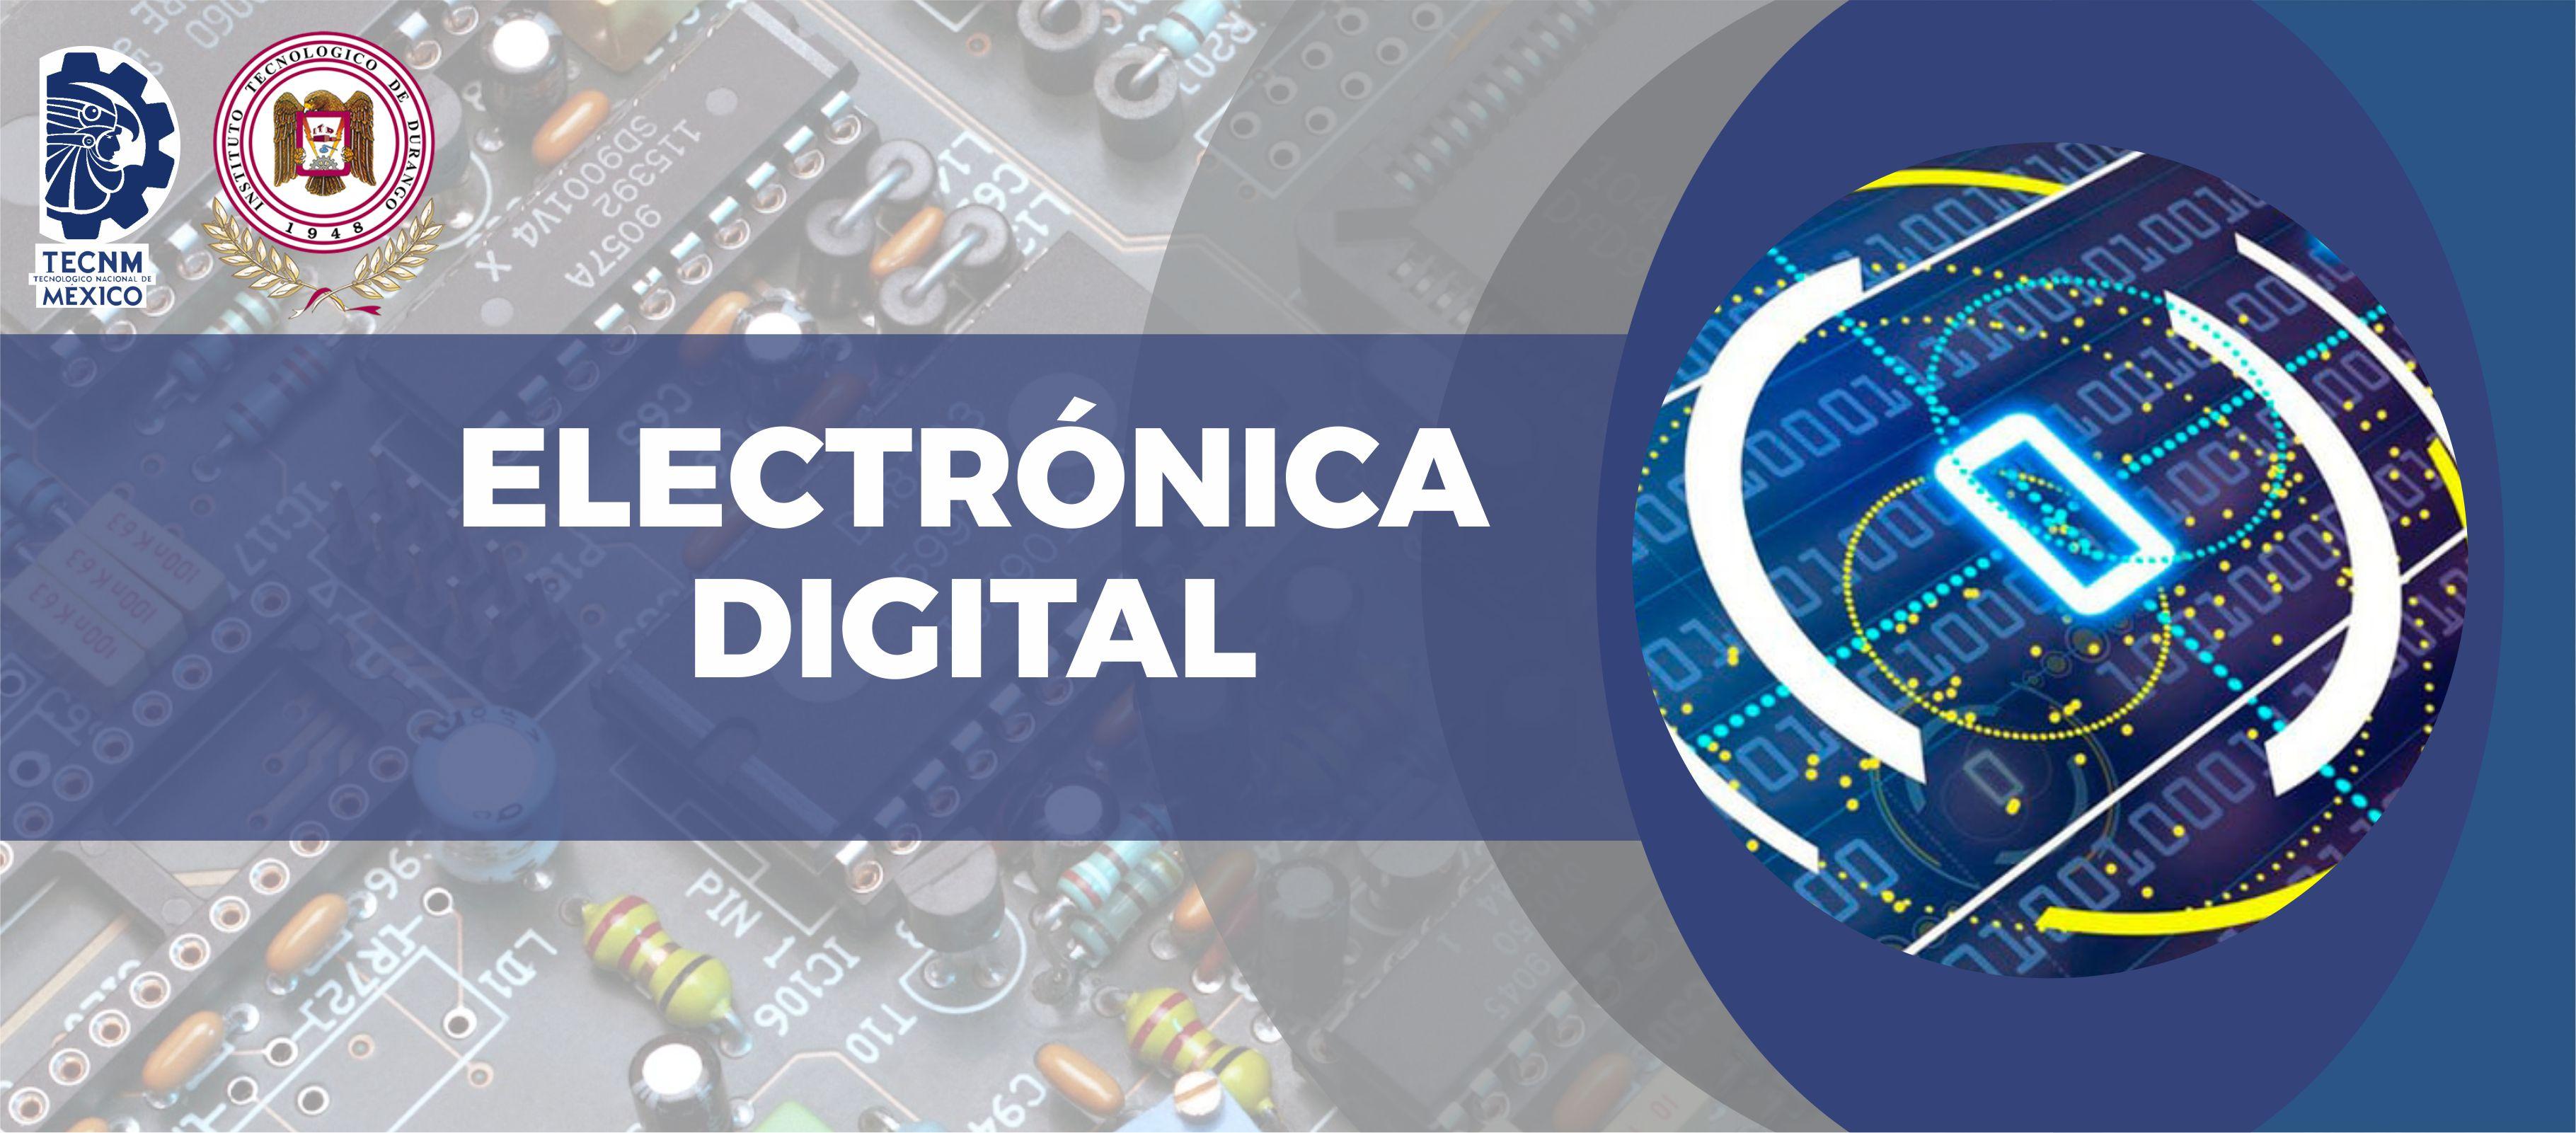 ELECTRONICA DIGITAL.